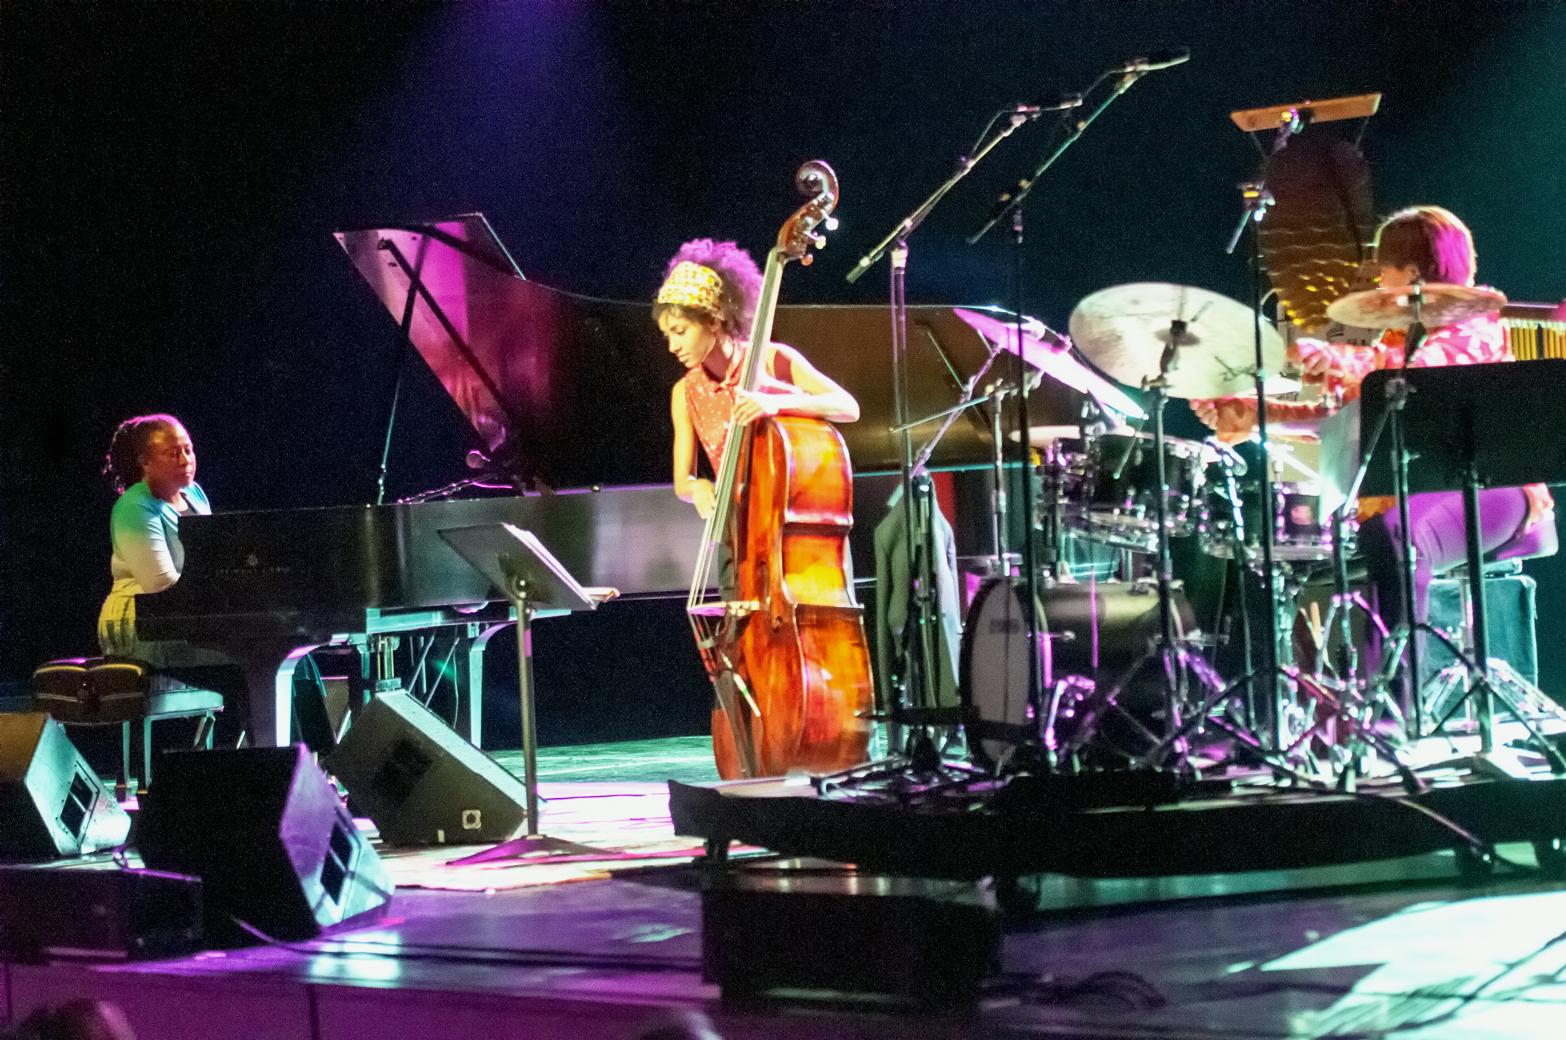 Geri allen, esperanza spalding and terri lynne carrington with acs at the montreal international jazz festival 2013